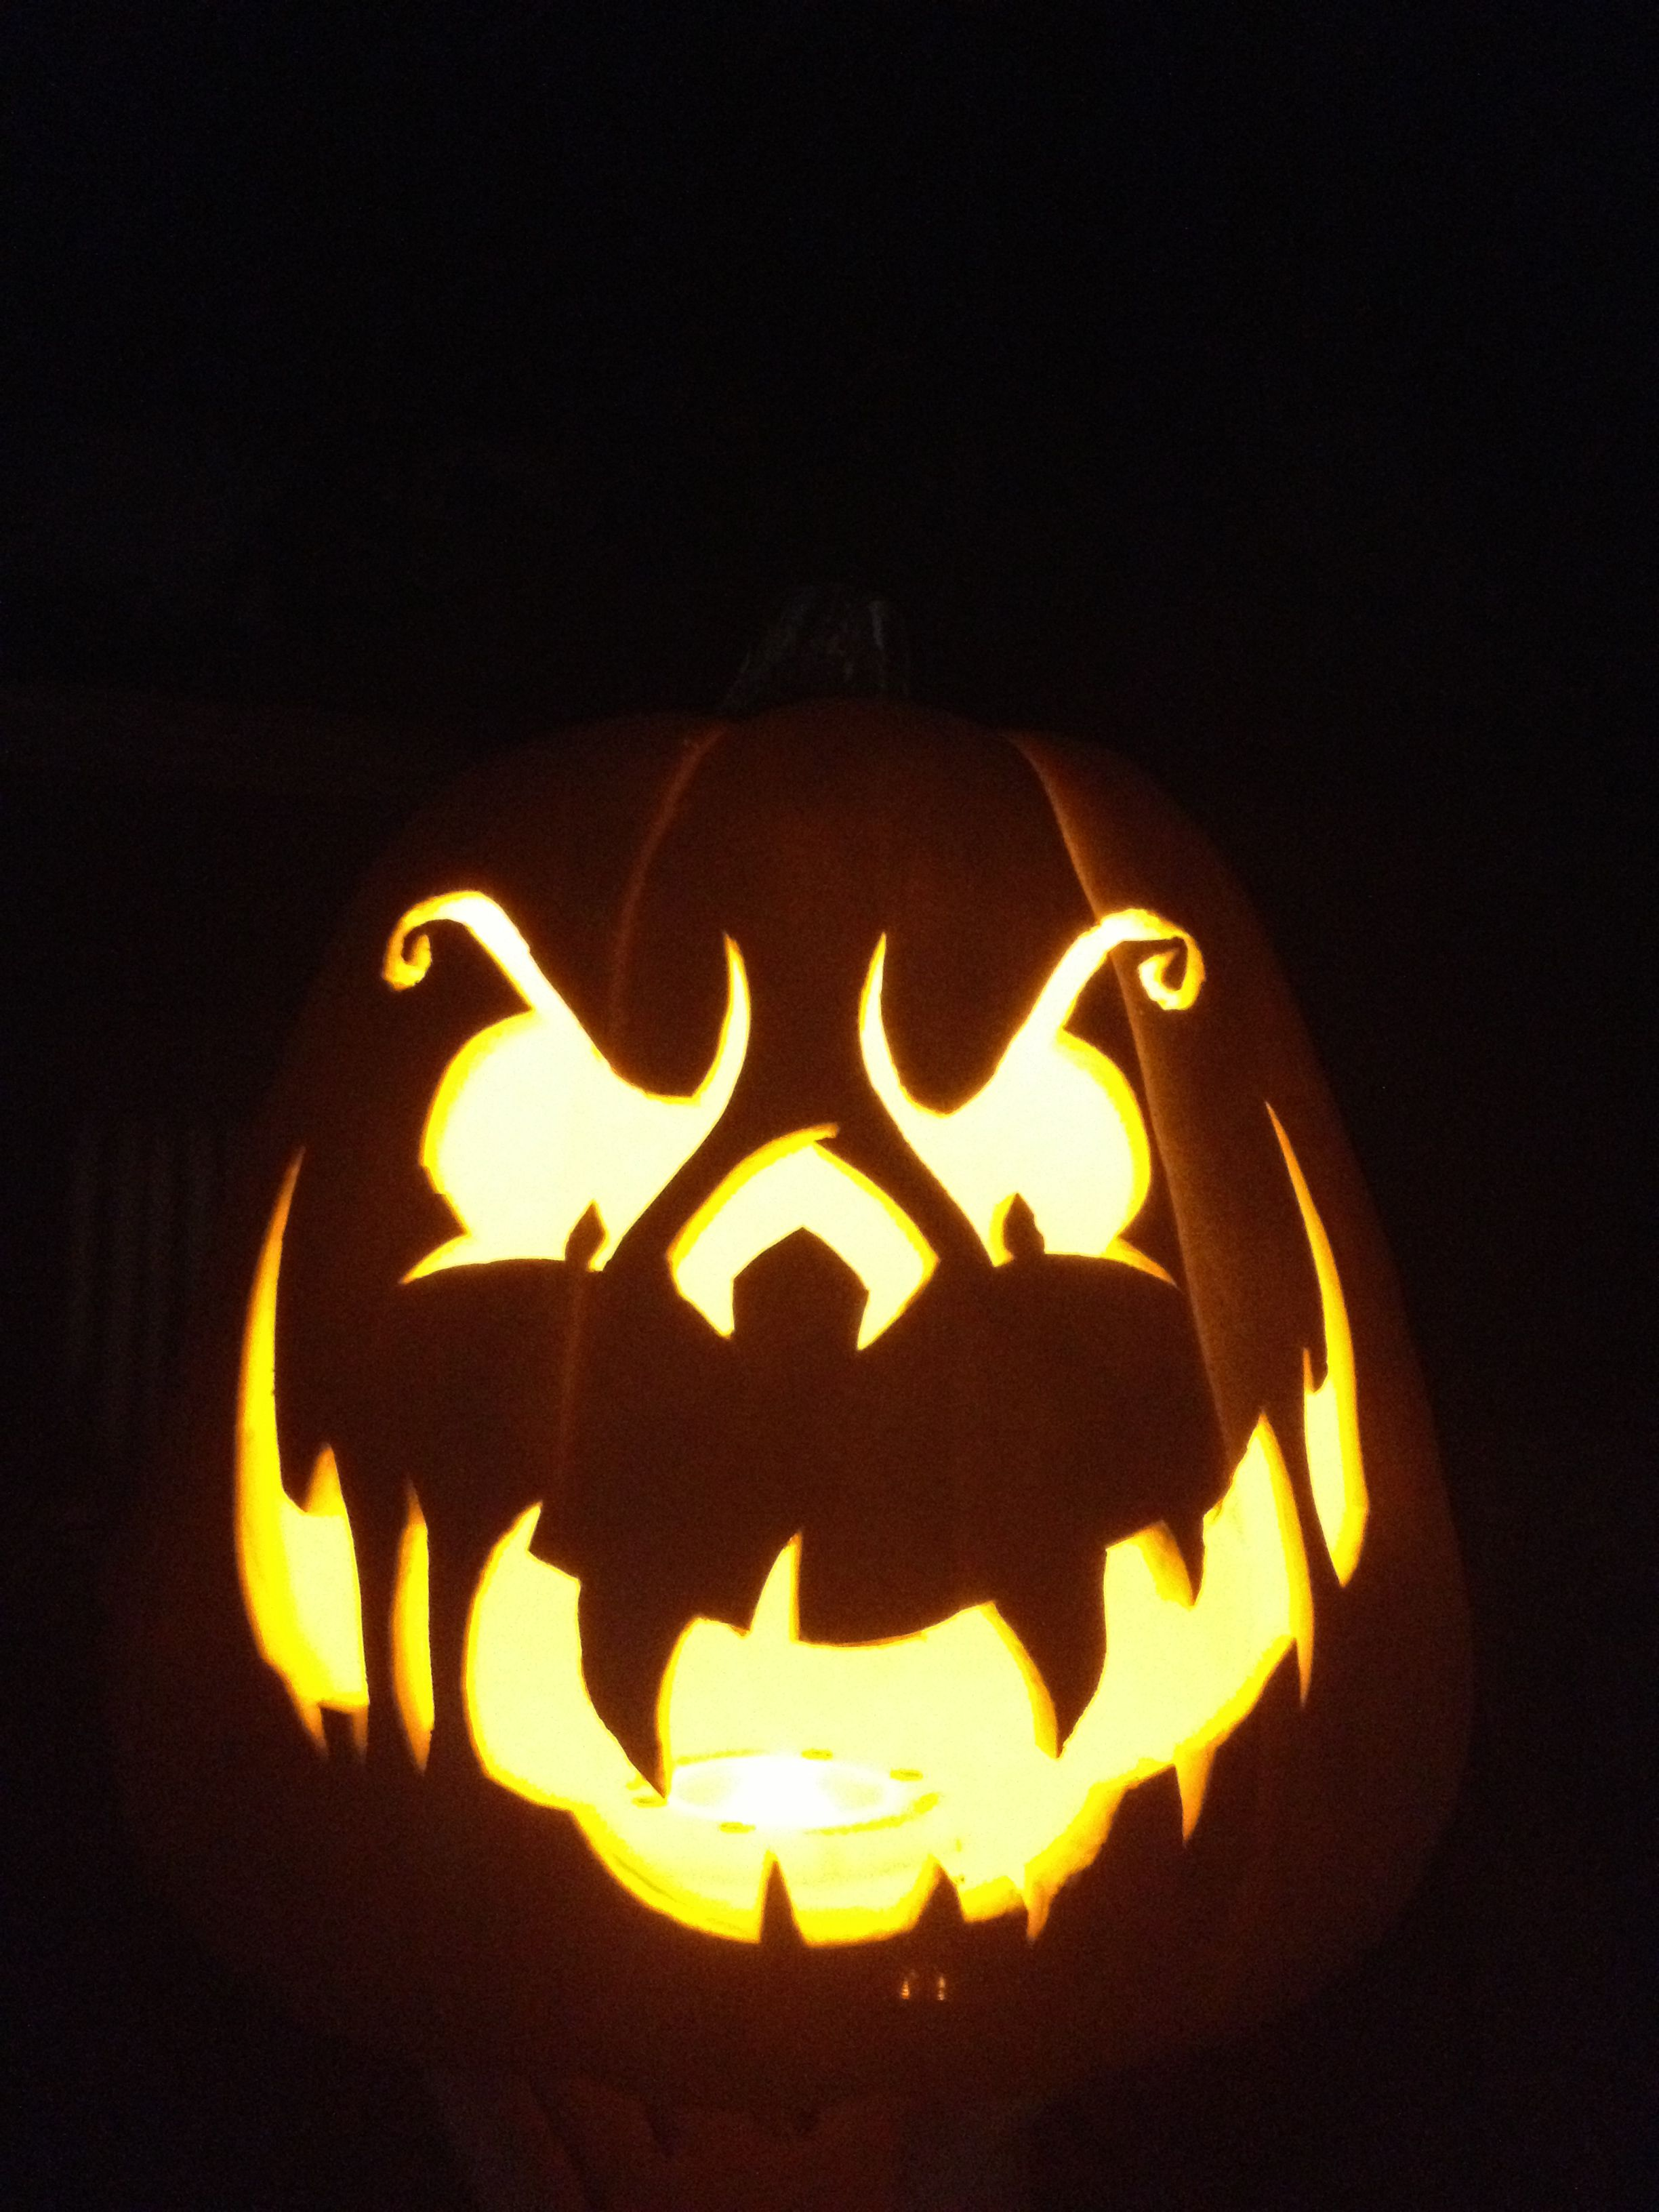 Jack-o-lantern - Pumpkin carving | Imaginative Pumpkin Art ...